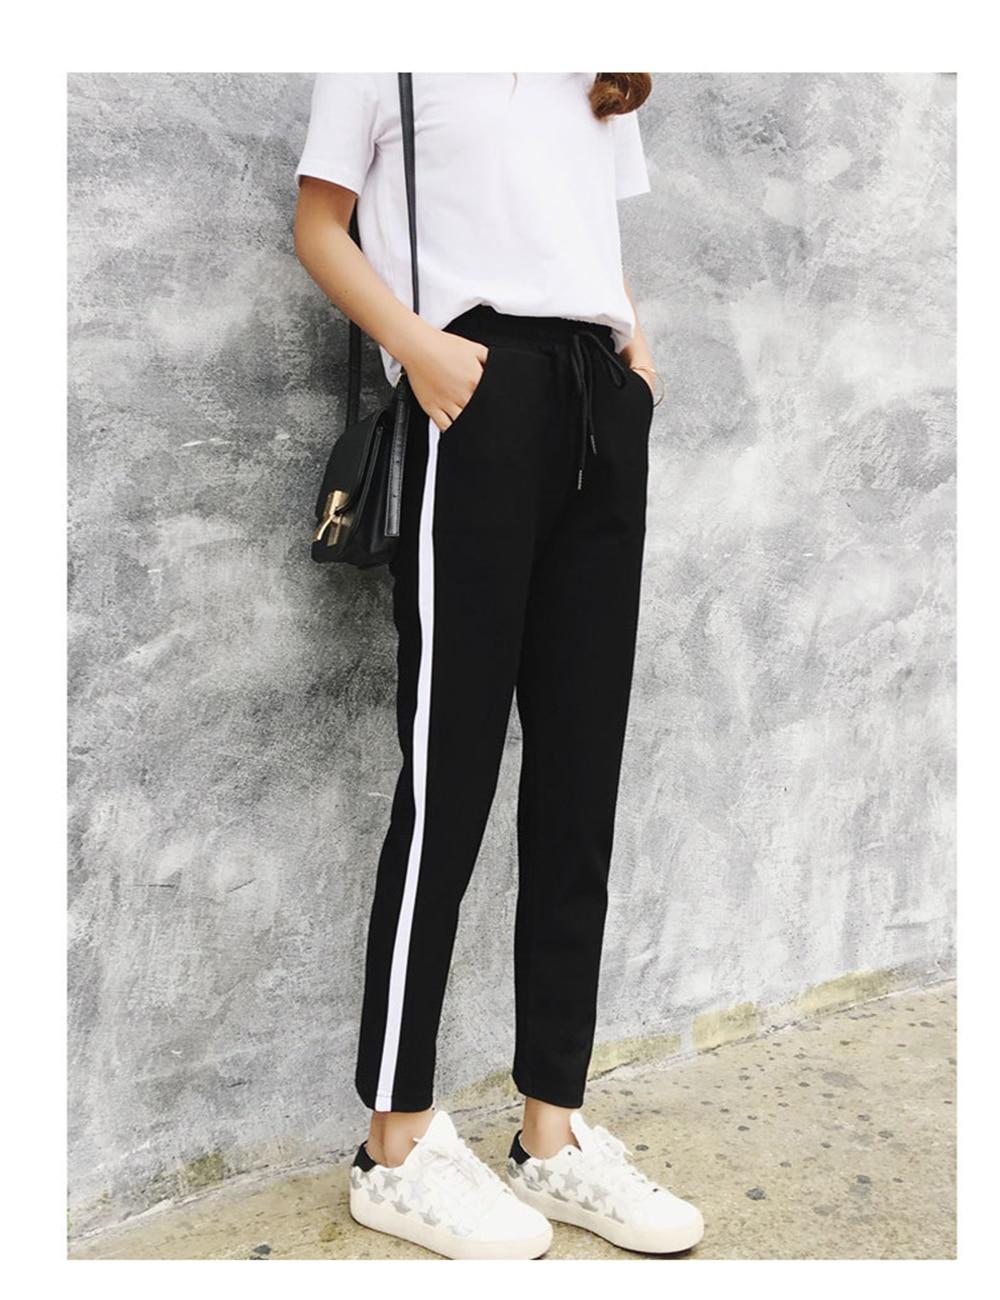 2018 Spring Sweatpants Trousers For Women Casual Harem Pants Harajuku Women's Pants Streetwear Loose Black Striped Pants Female